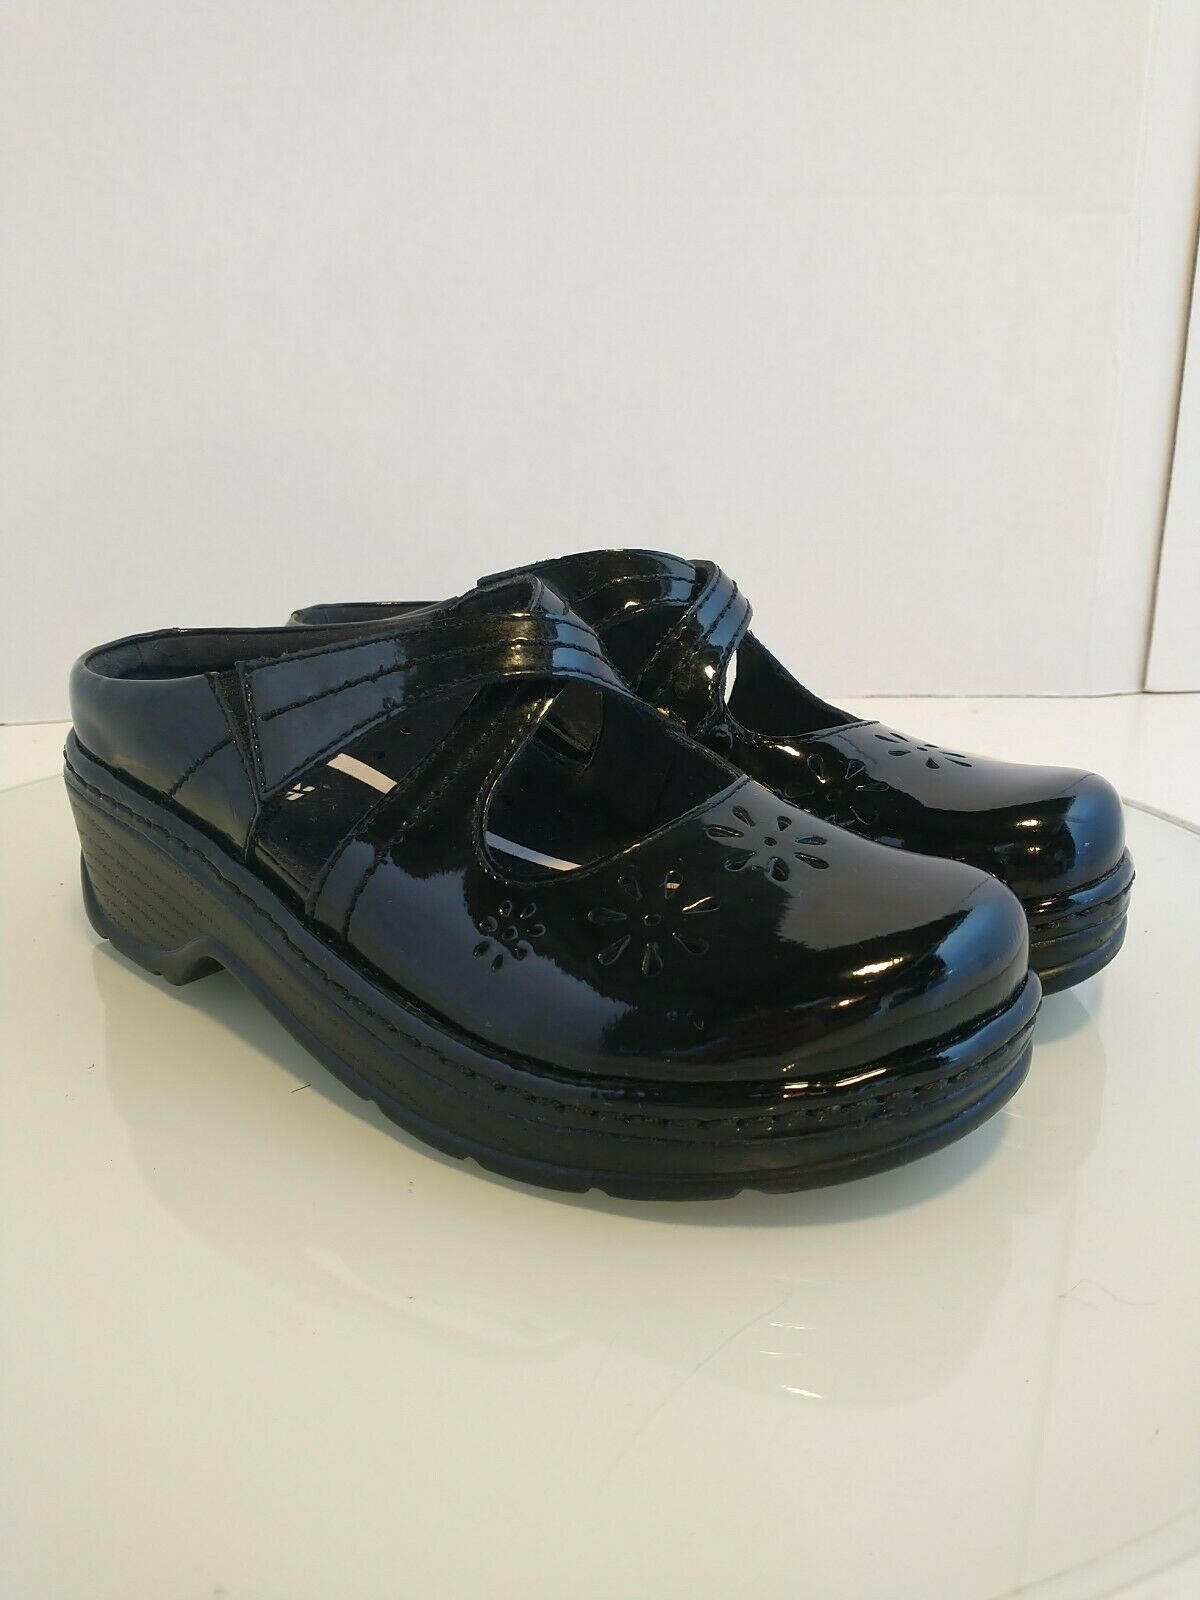 Klogs Mary Jane Black Leather Slip On Mules Clogs Shoes Women's Size 7M EUC!!